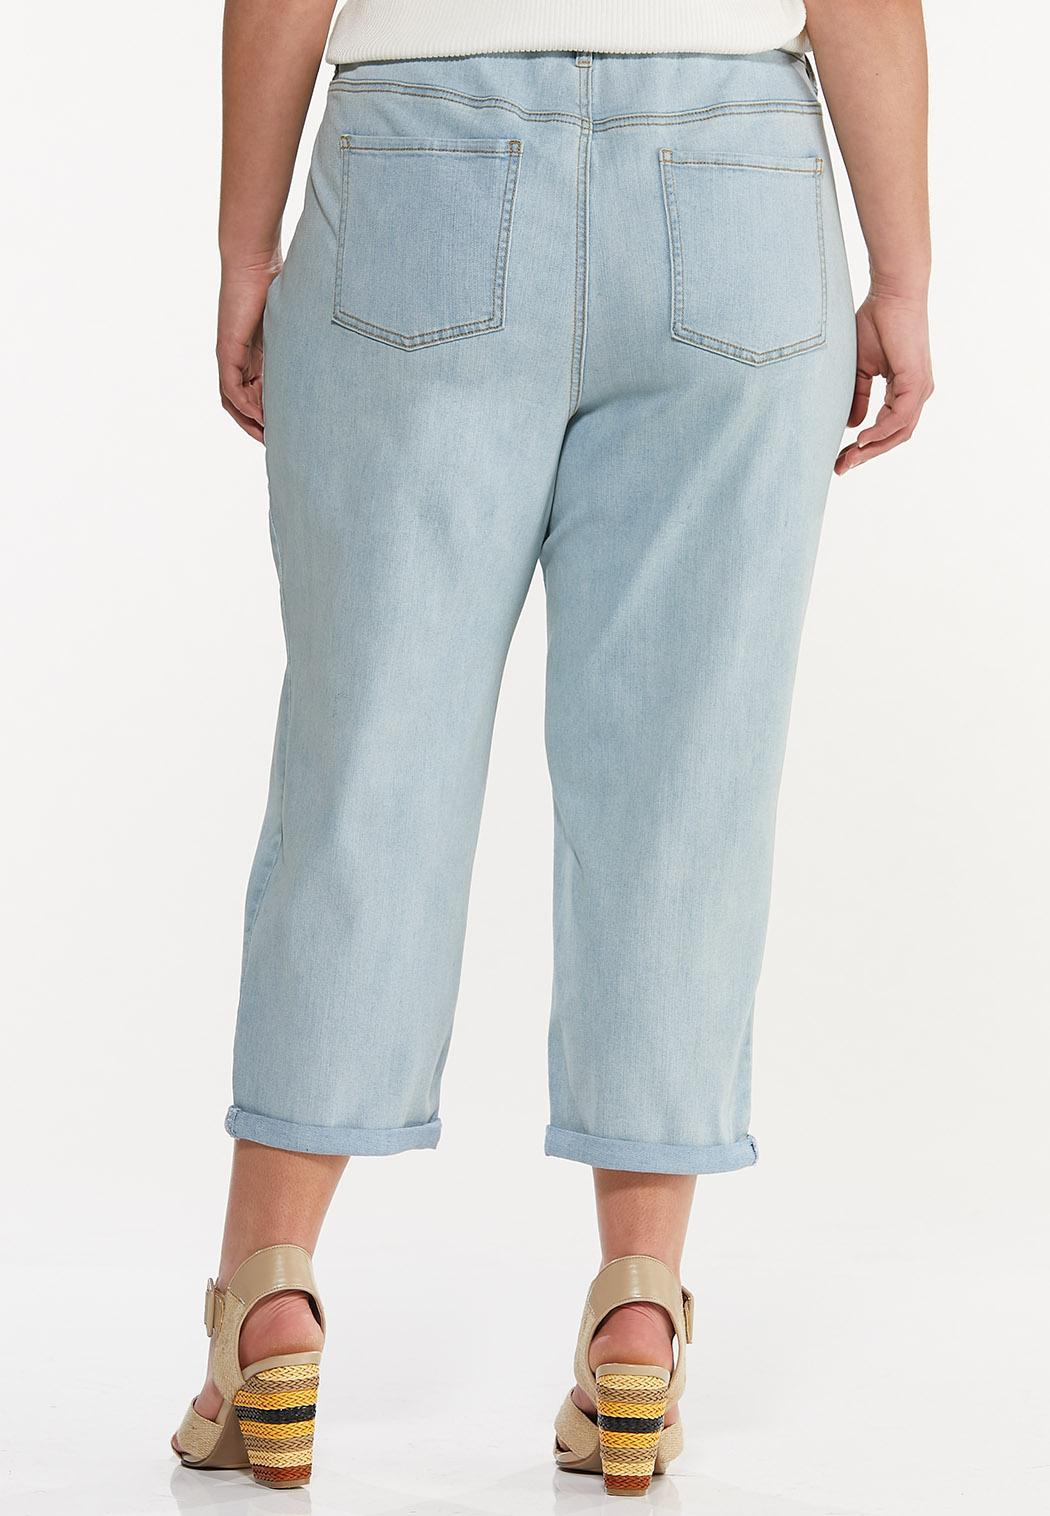 Plus Size Cropped Distressed Boyfriend Jeans (Item #44575785)